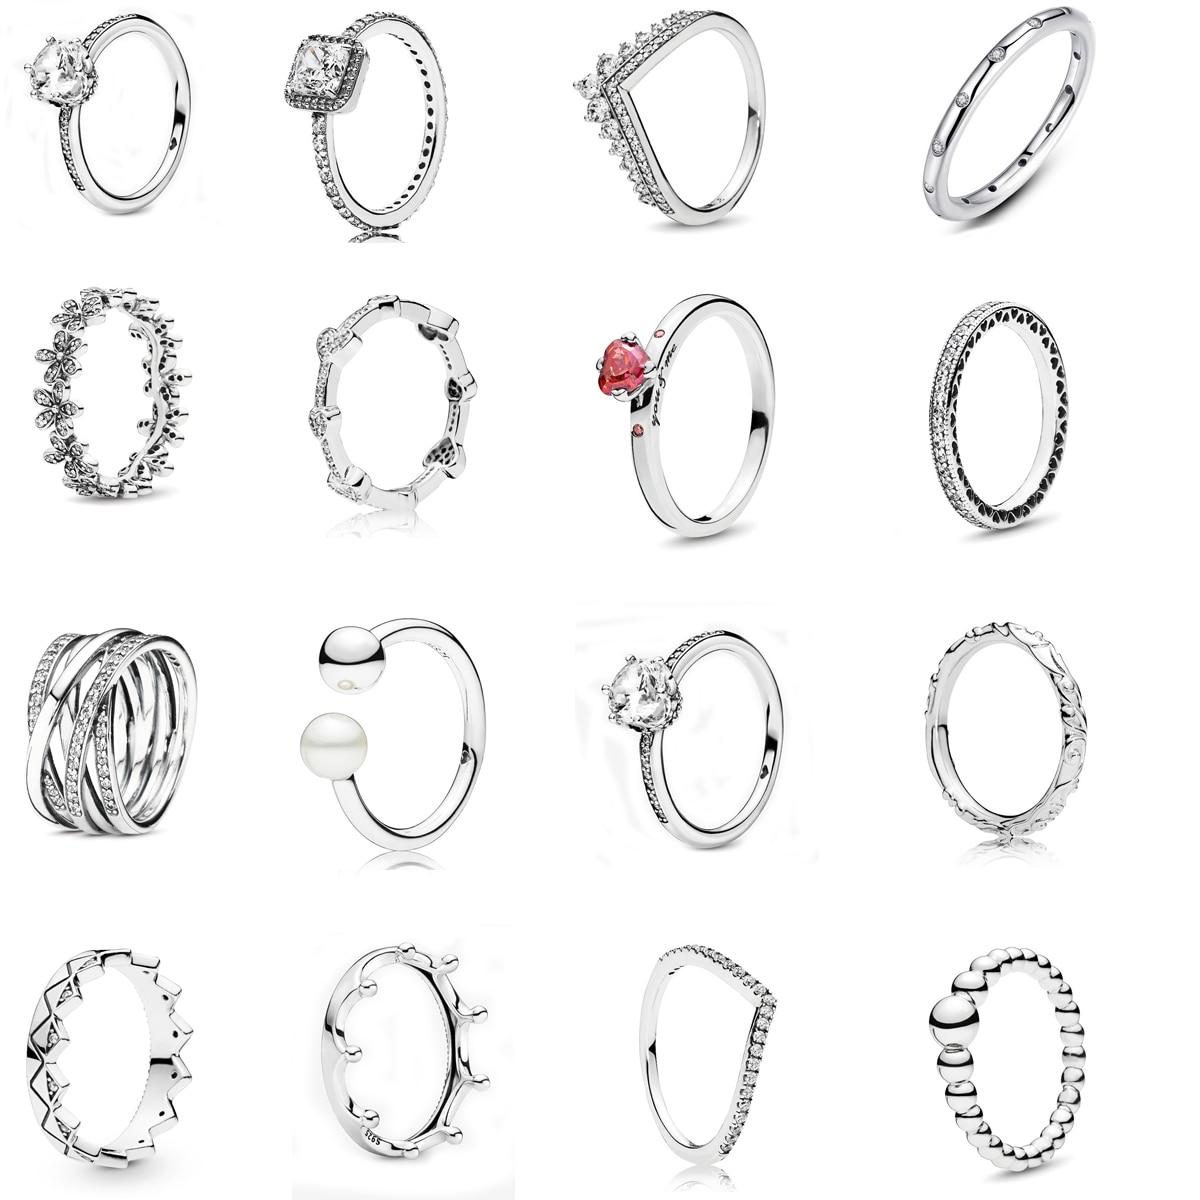 2020, nuevo, envío gratis, auténtico, Plata de Ley 925, anillos de rayas, anillo de corona exótica para mujer, joyería DIY, anillos S925